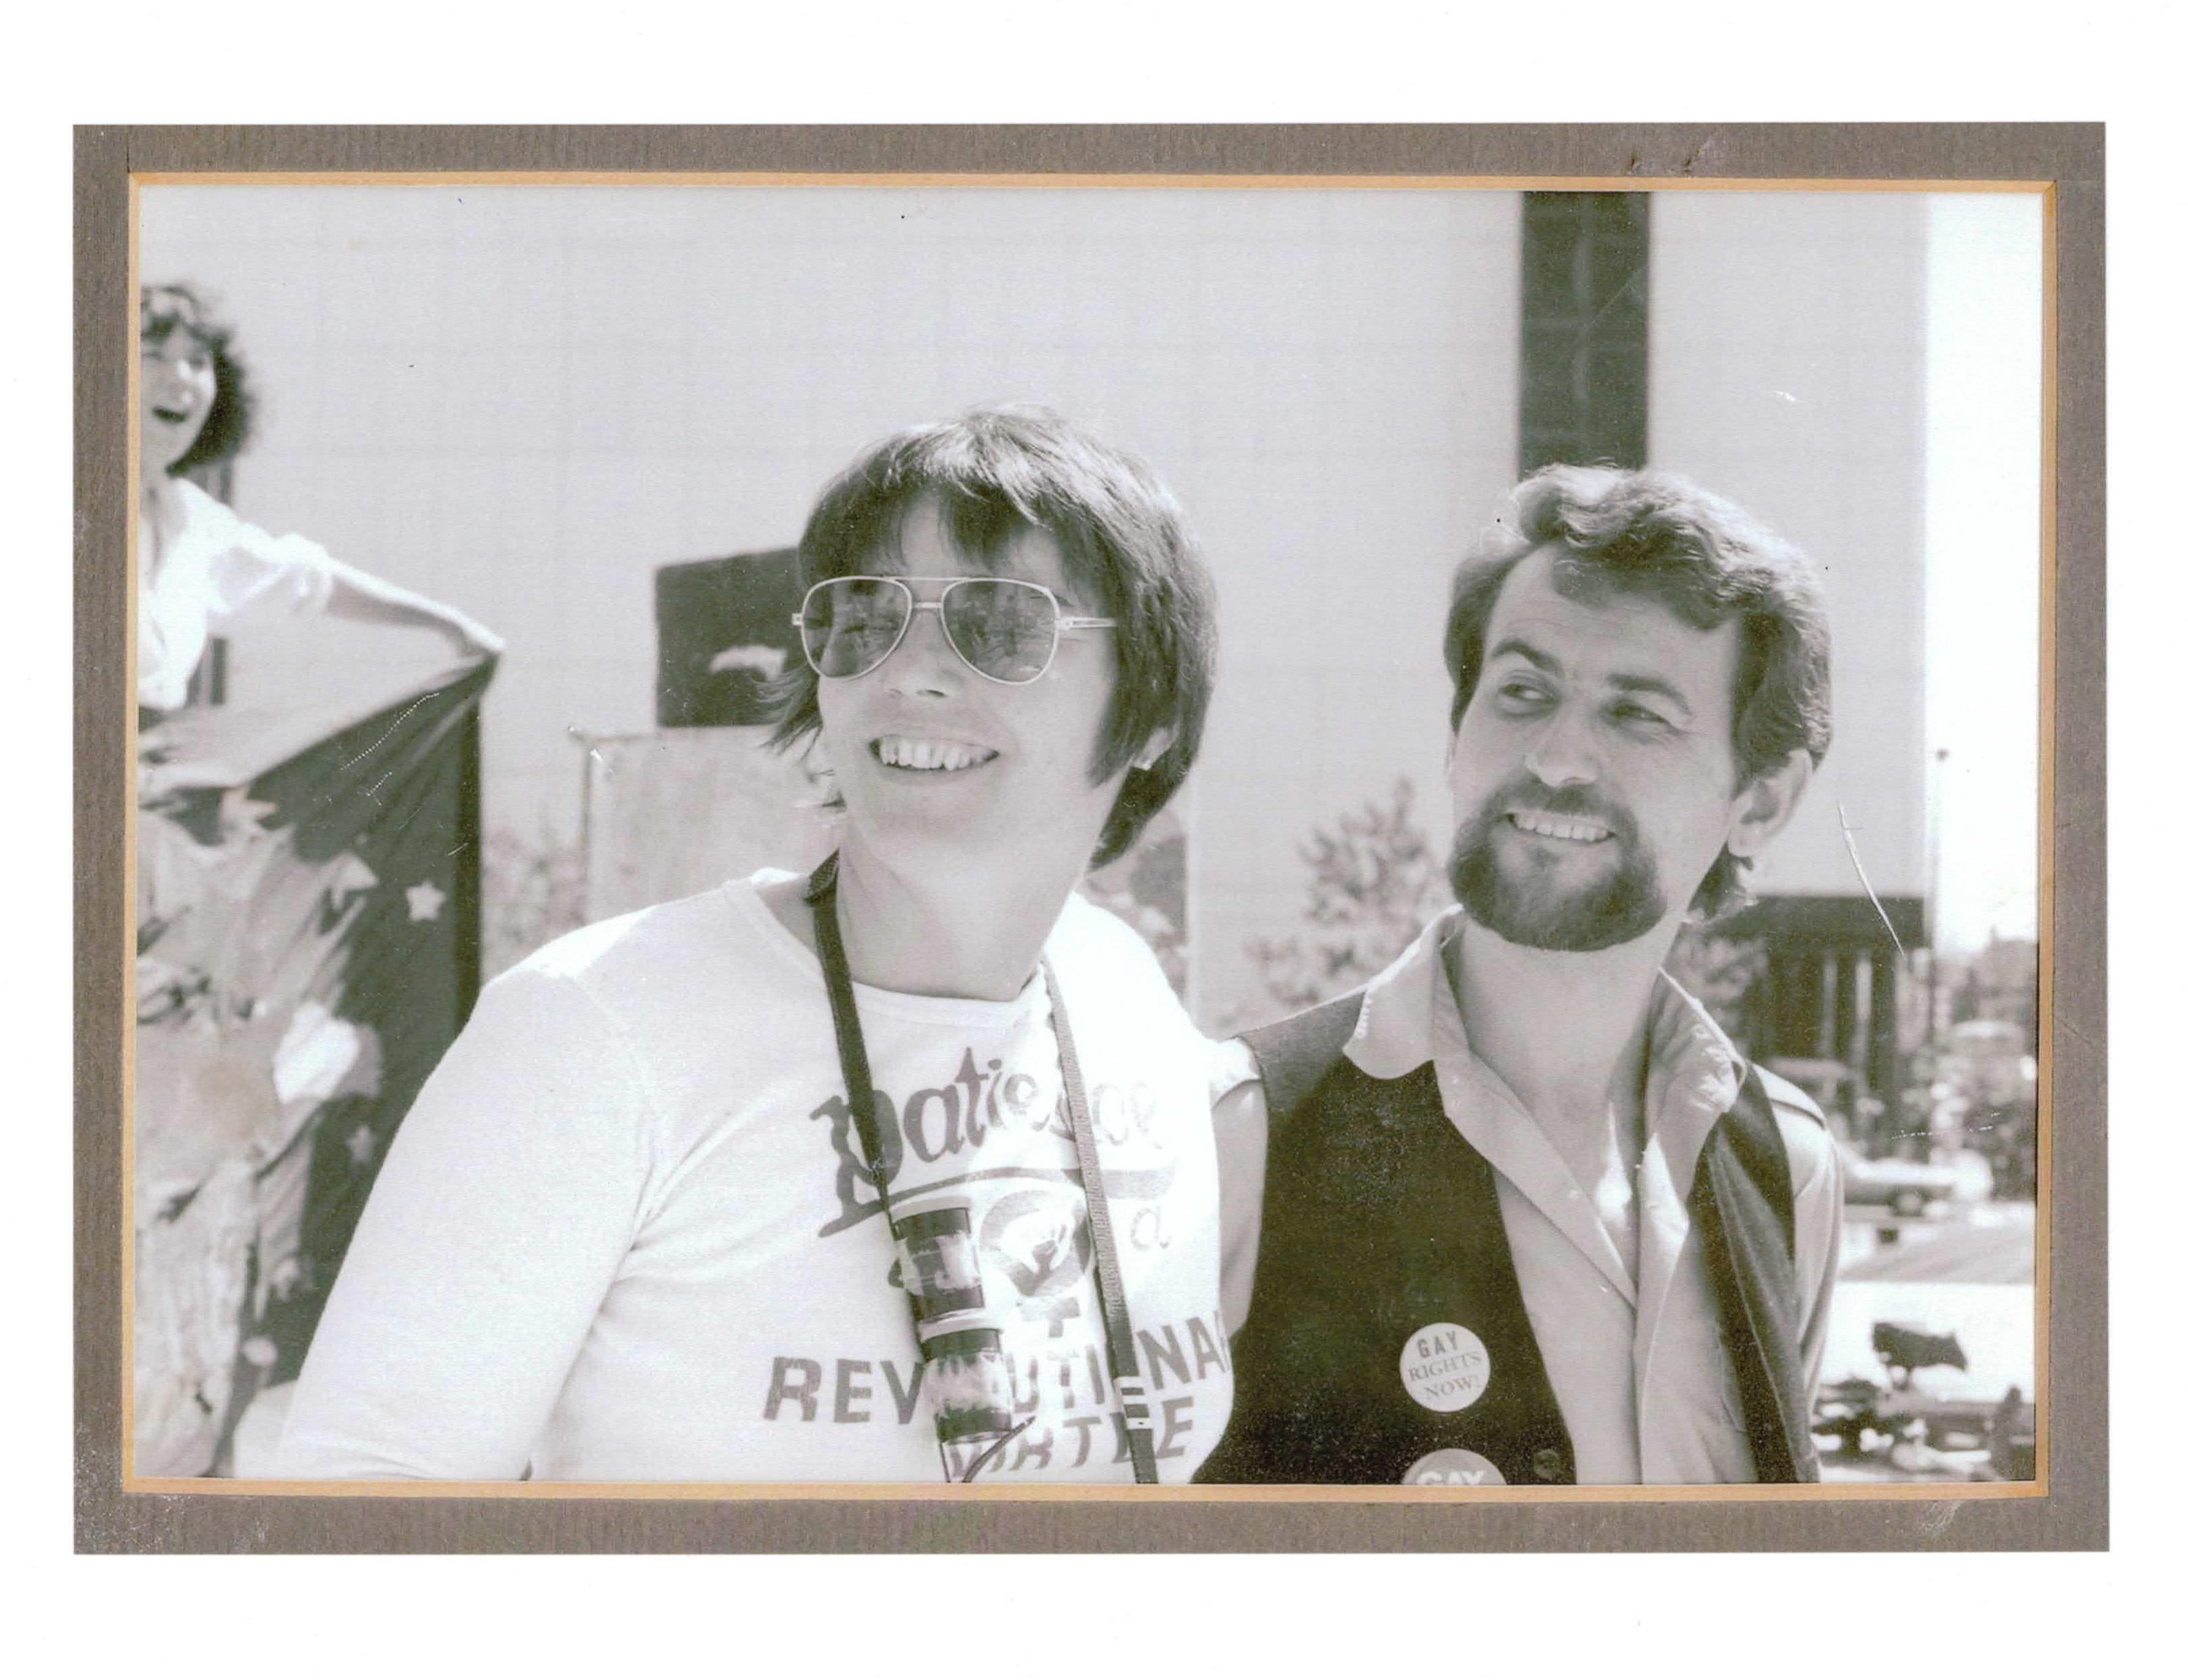 Don Hann, right, with feminist Cy-Thea Sand at a rally against violence, circa 1979. (Don Hann)